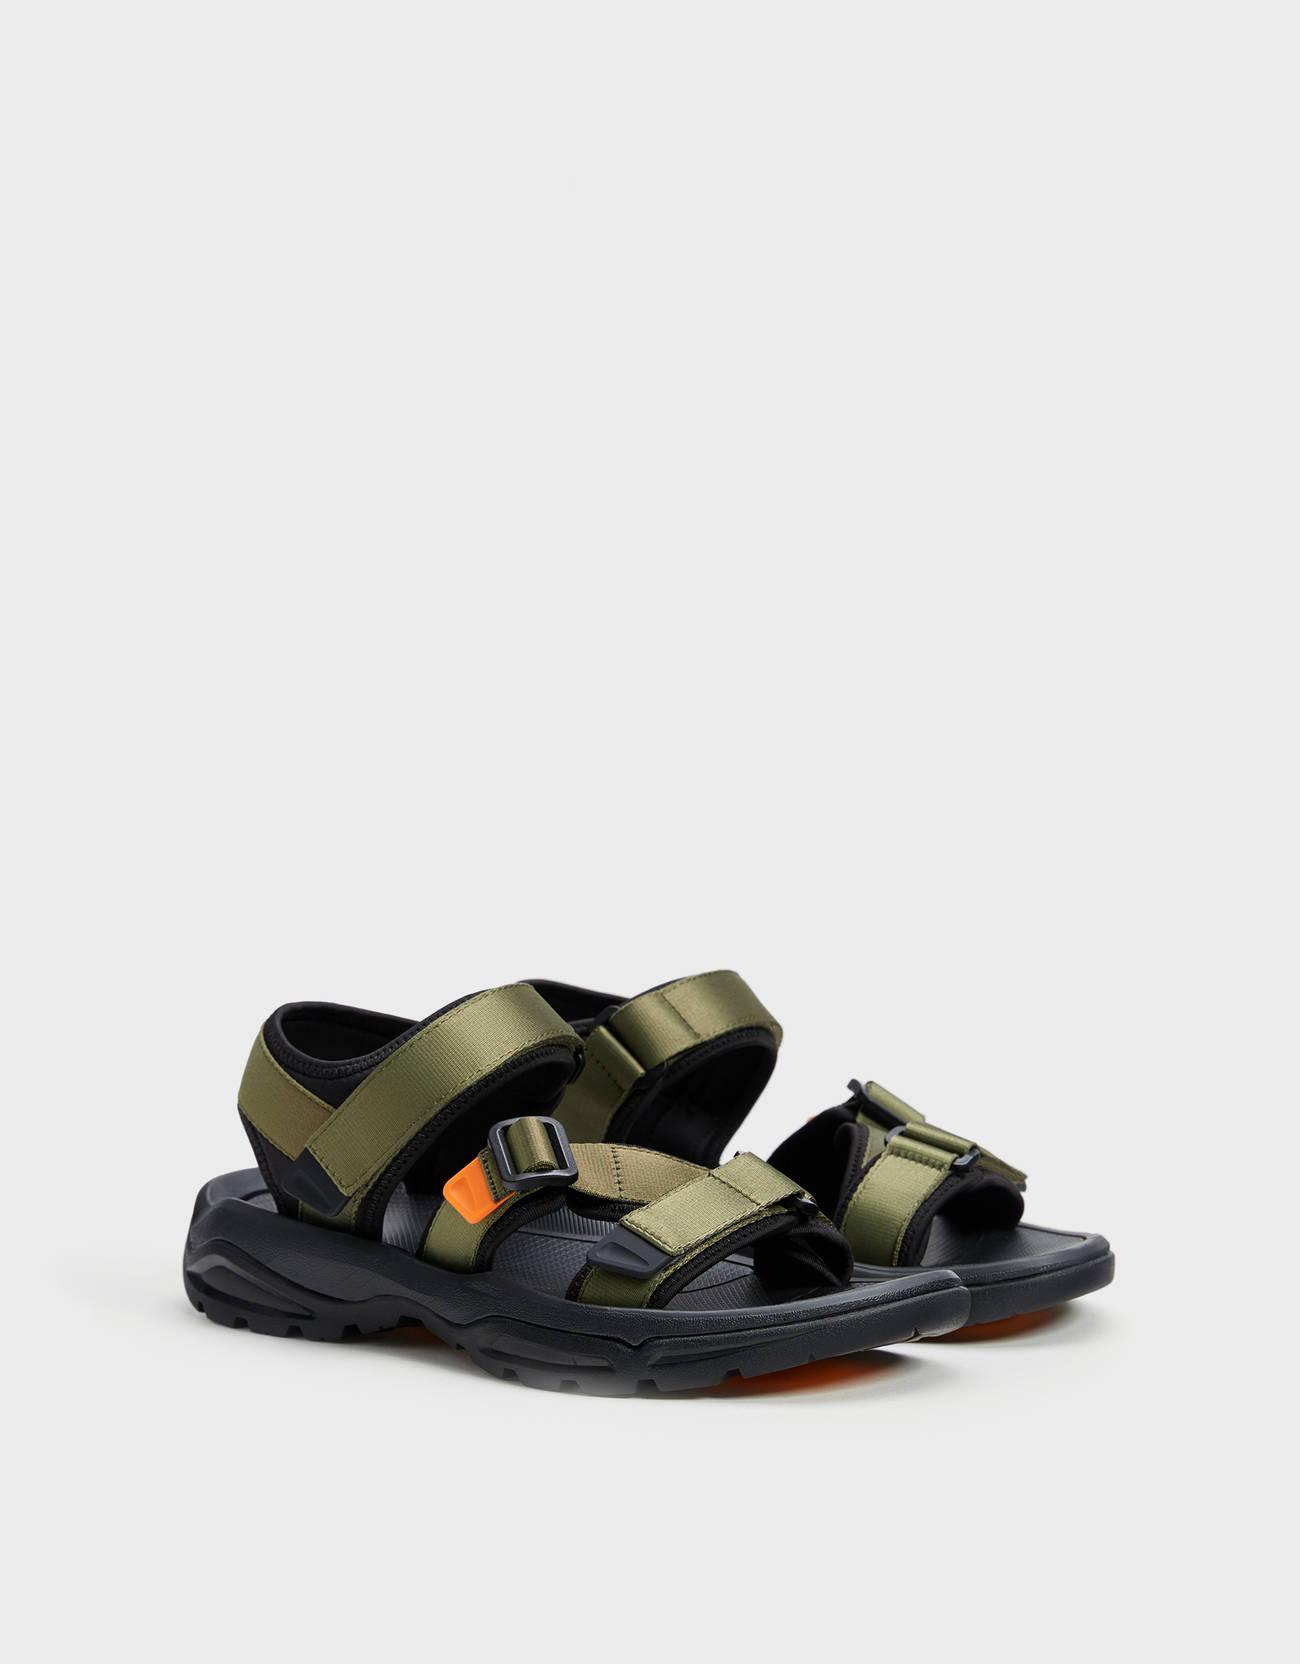 Men's contrast technical sandals